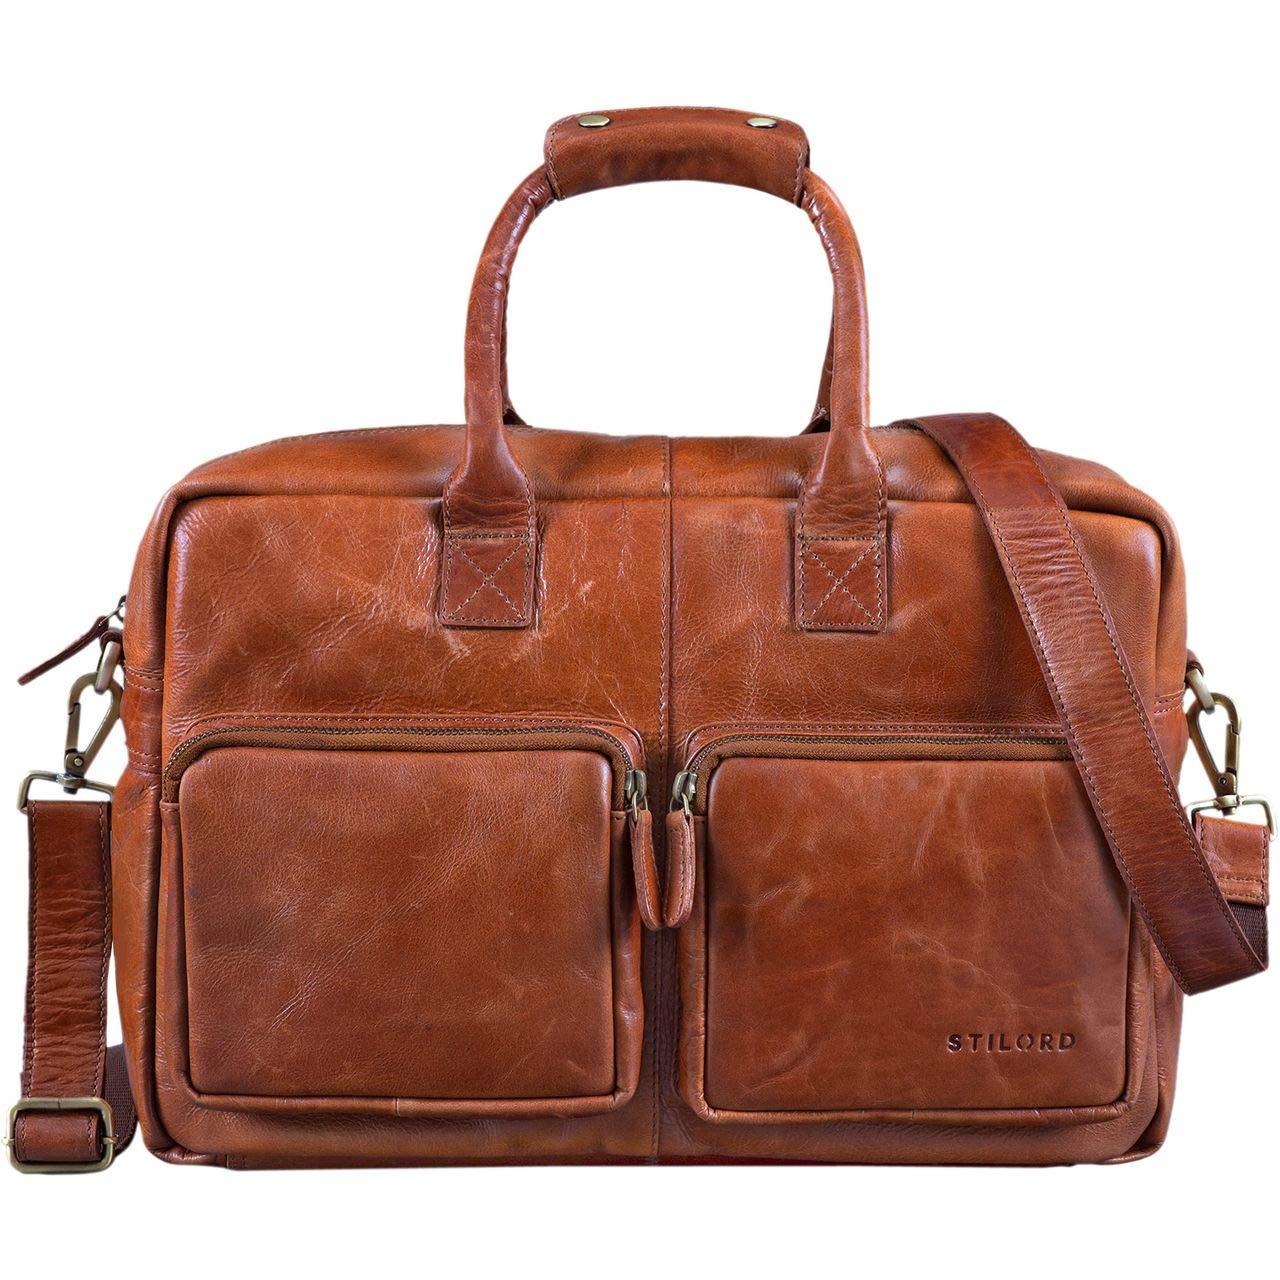 STILORD 'Henri' Briefcase Leather Vintage 15,6 Inch Business Bag Laptop MacBook University Buffalo Leather, Colour:Black